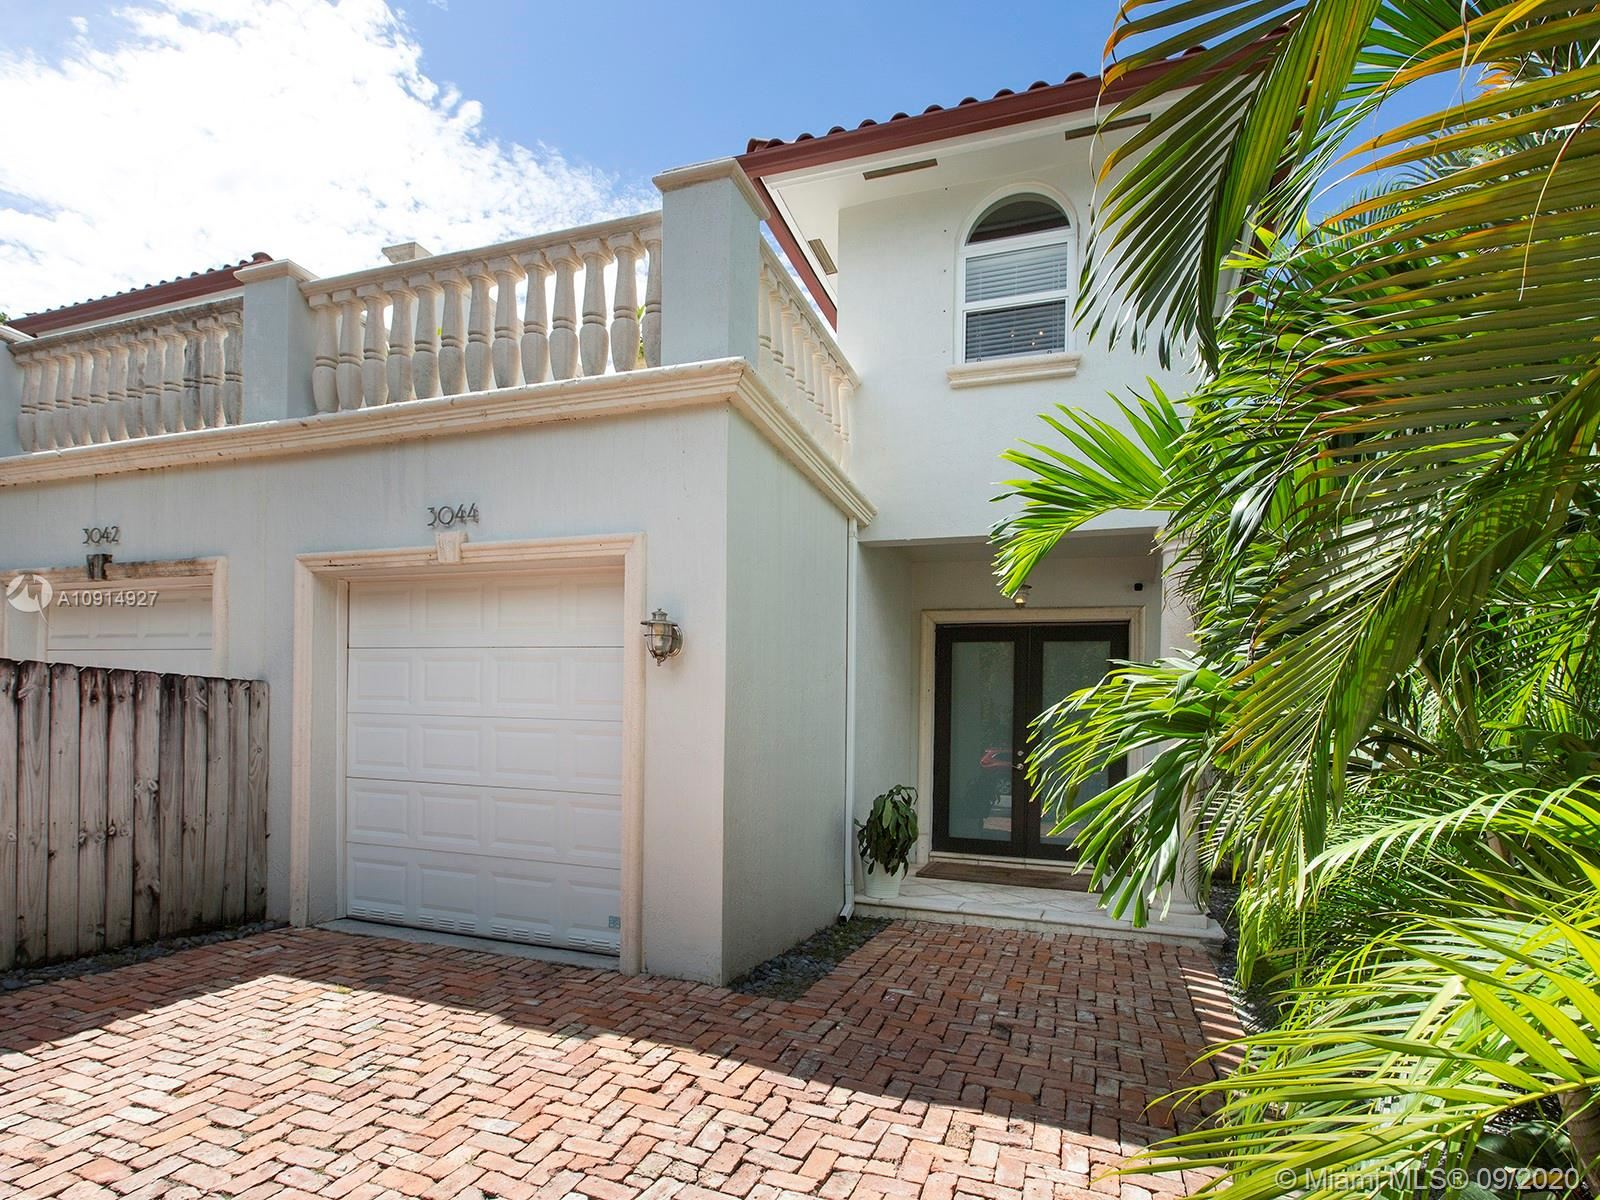 3044 Orange St #3044, Miami, FL 33133 - #: A10914927